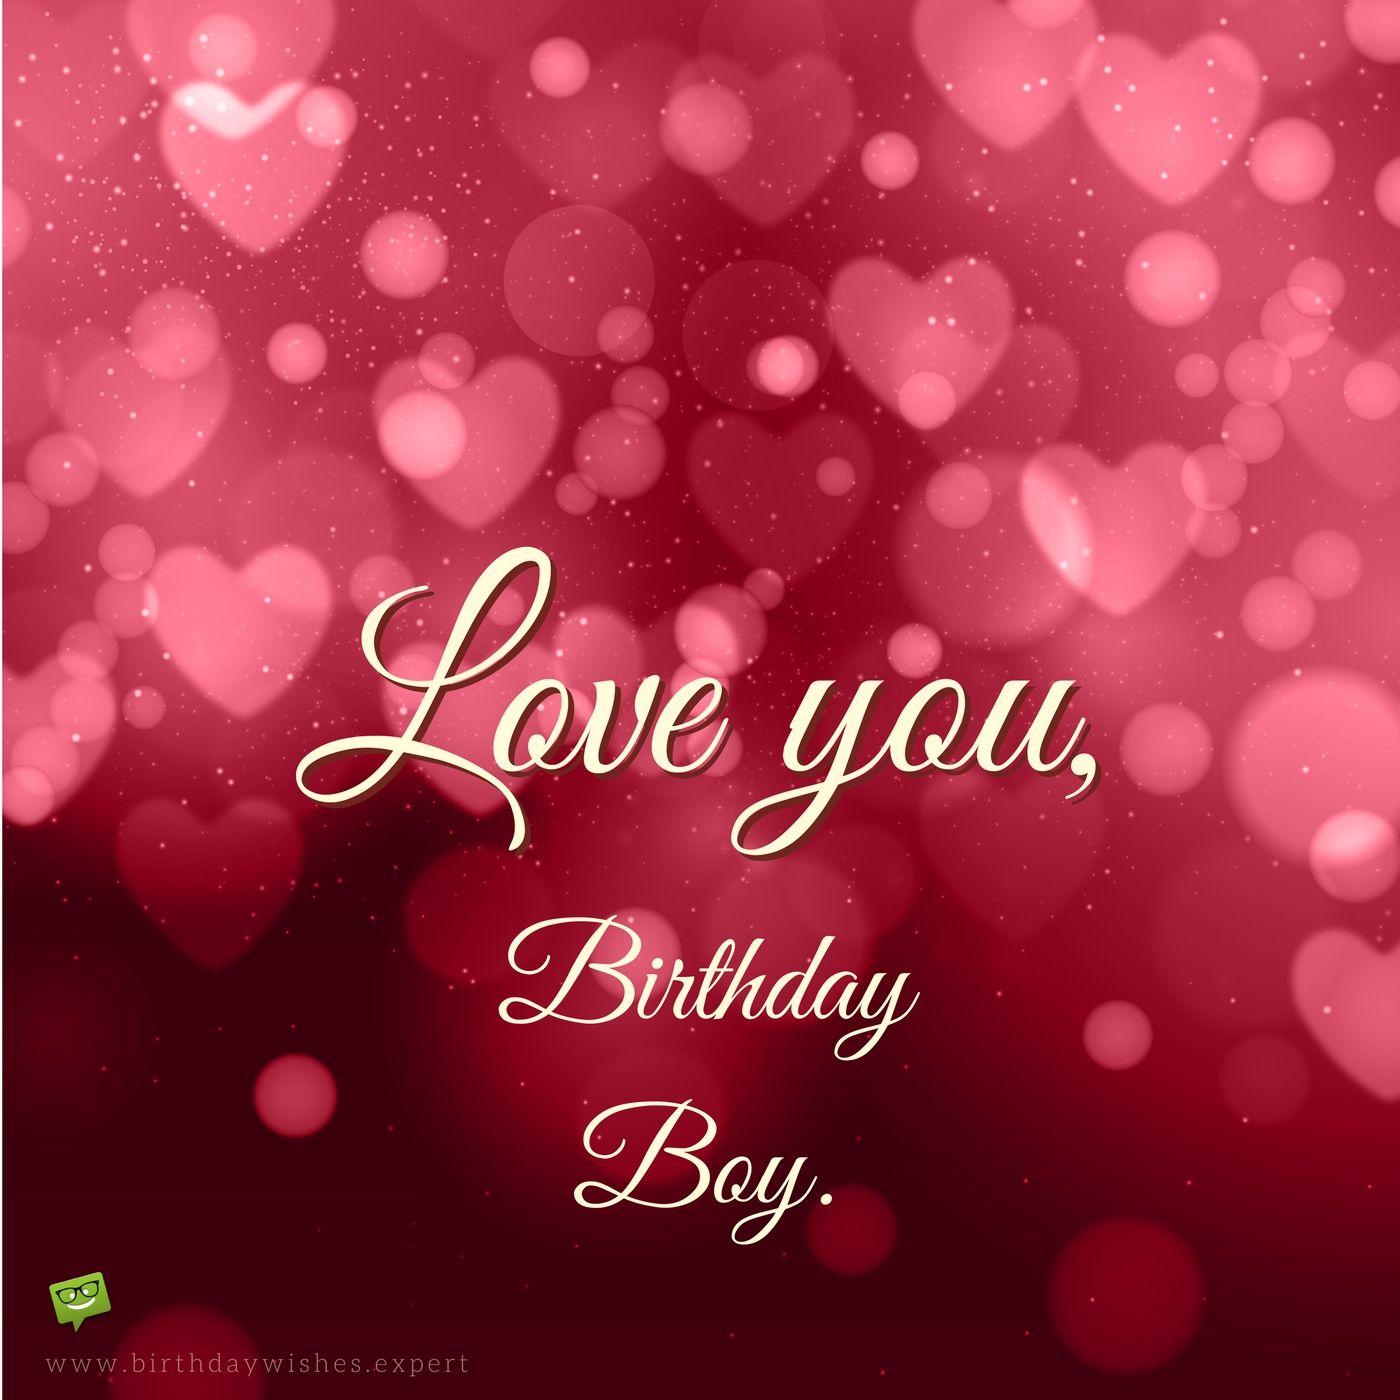 Smart Happy Birthday Wishes for your Boyfriend